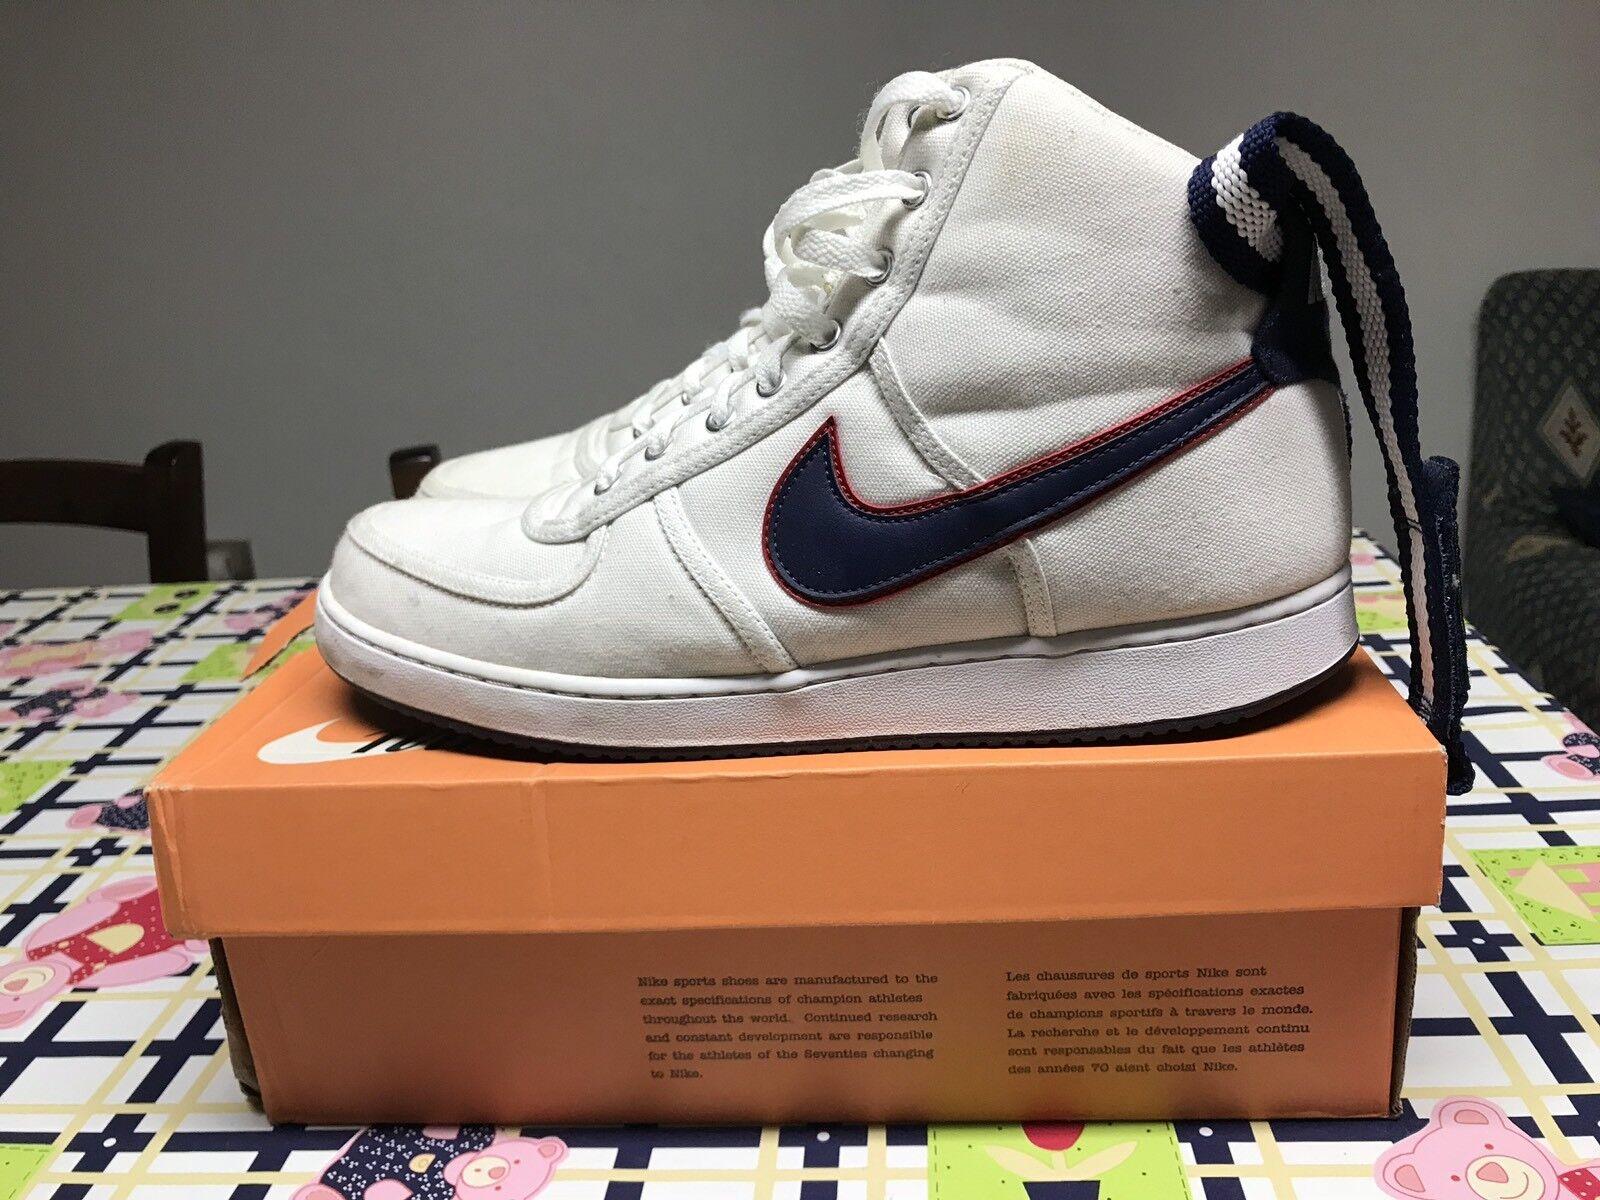 scarpe da ginnastica uomo Nike Toki vntg num.45 LIMITED EDT. OTTIME CONDIZIONI